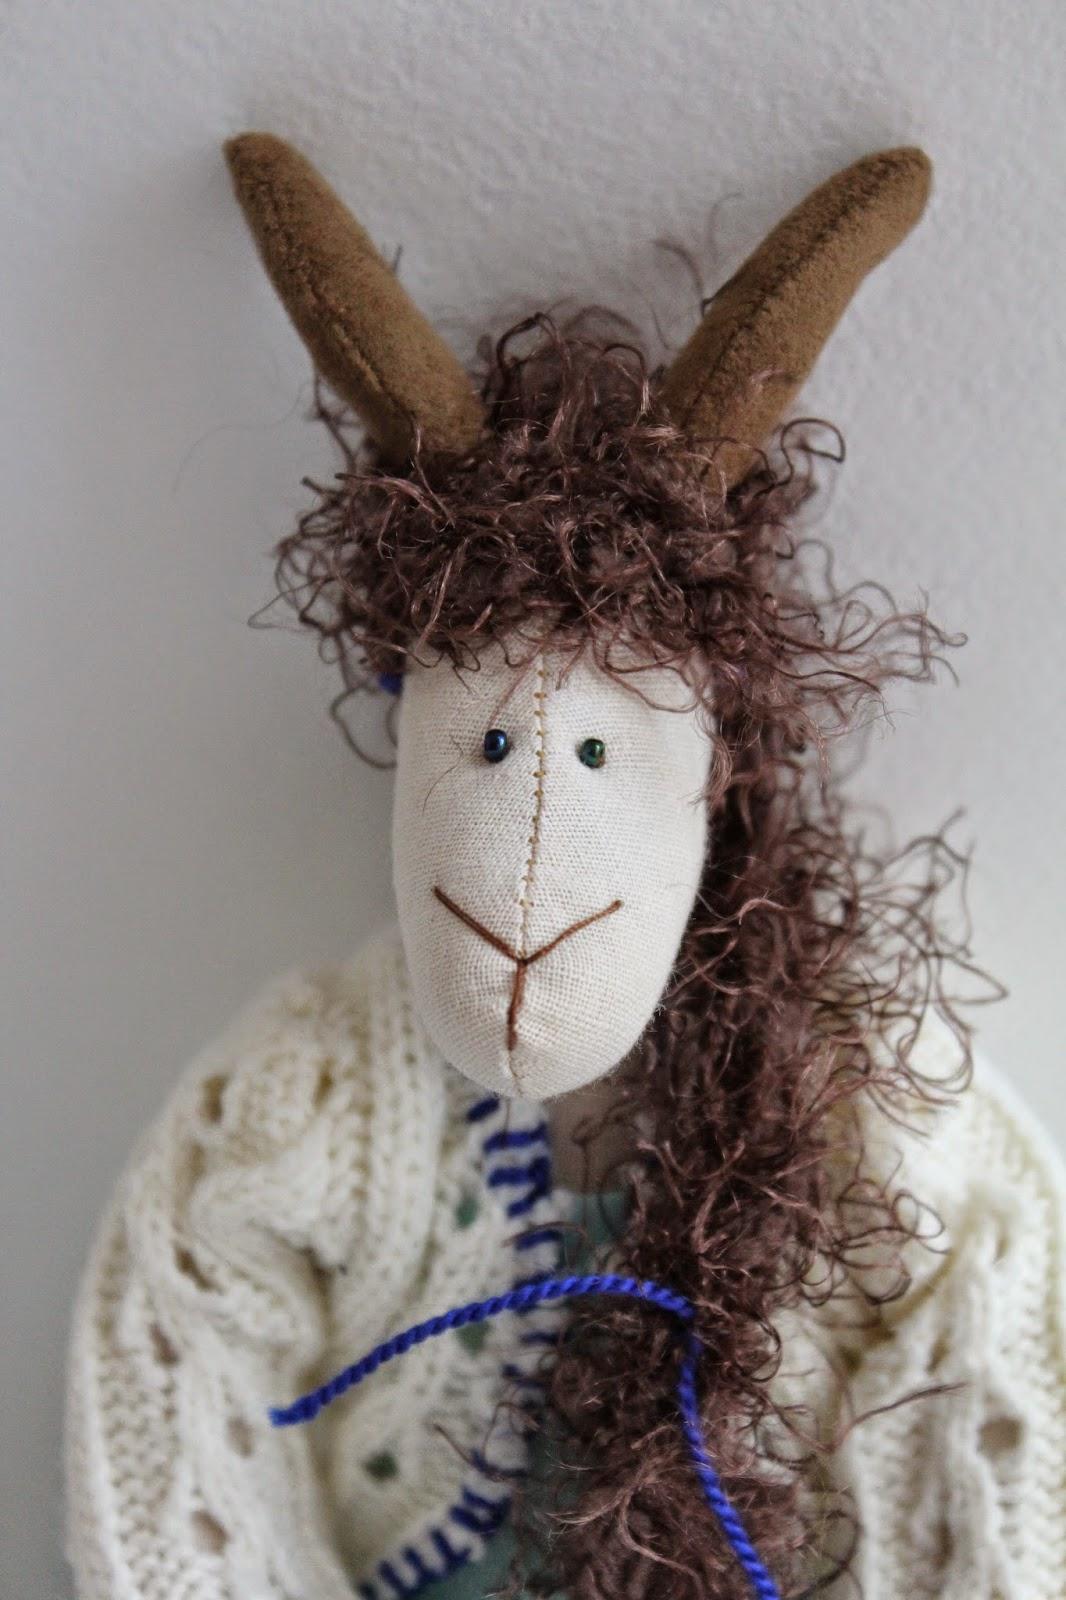 коза-дереза, козочка, интерьерная, игрушка